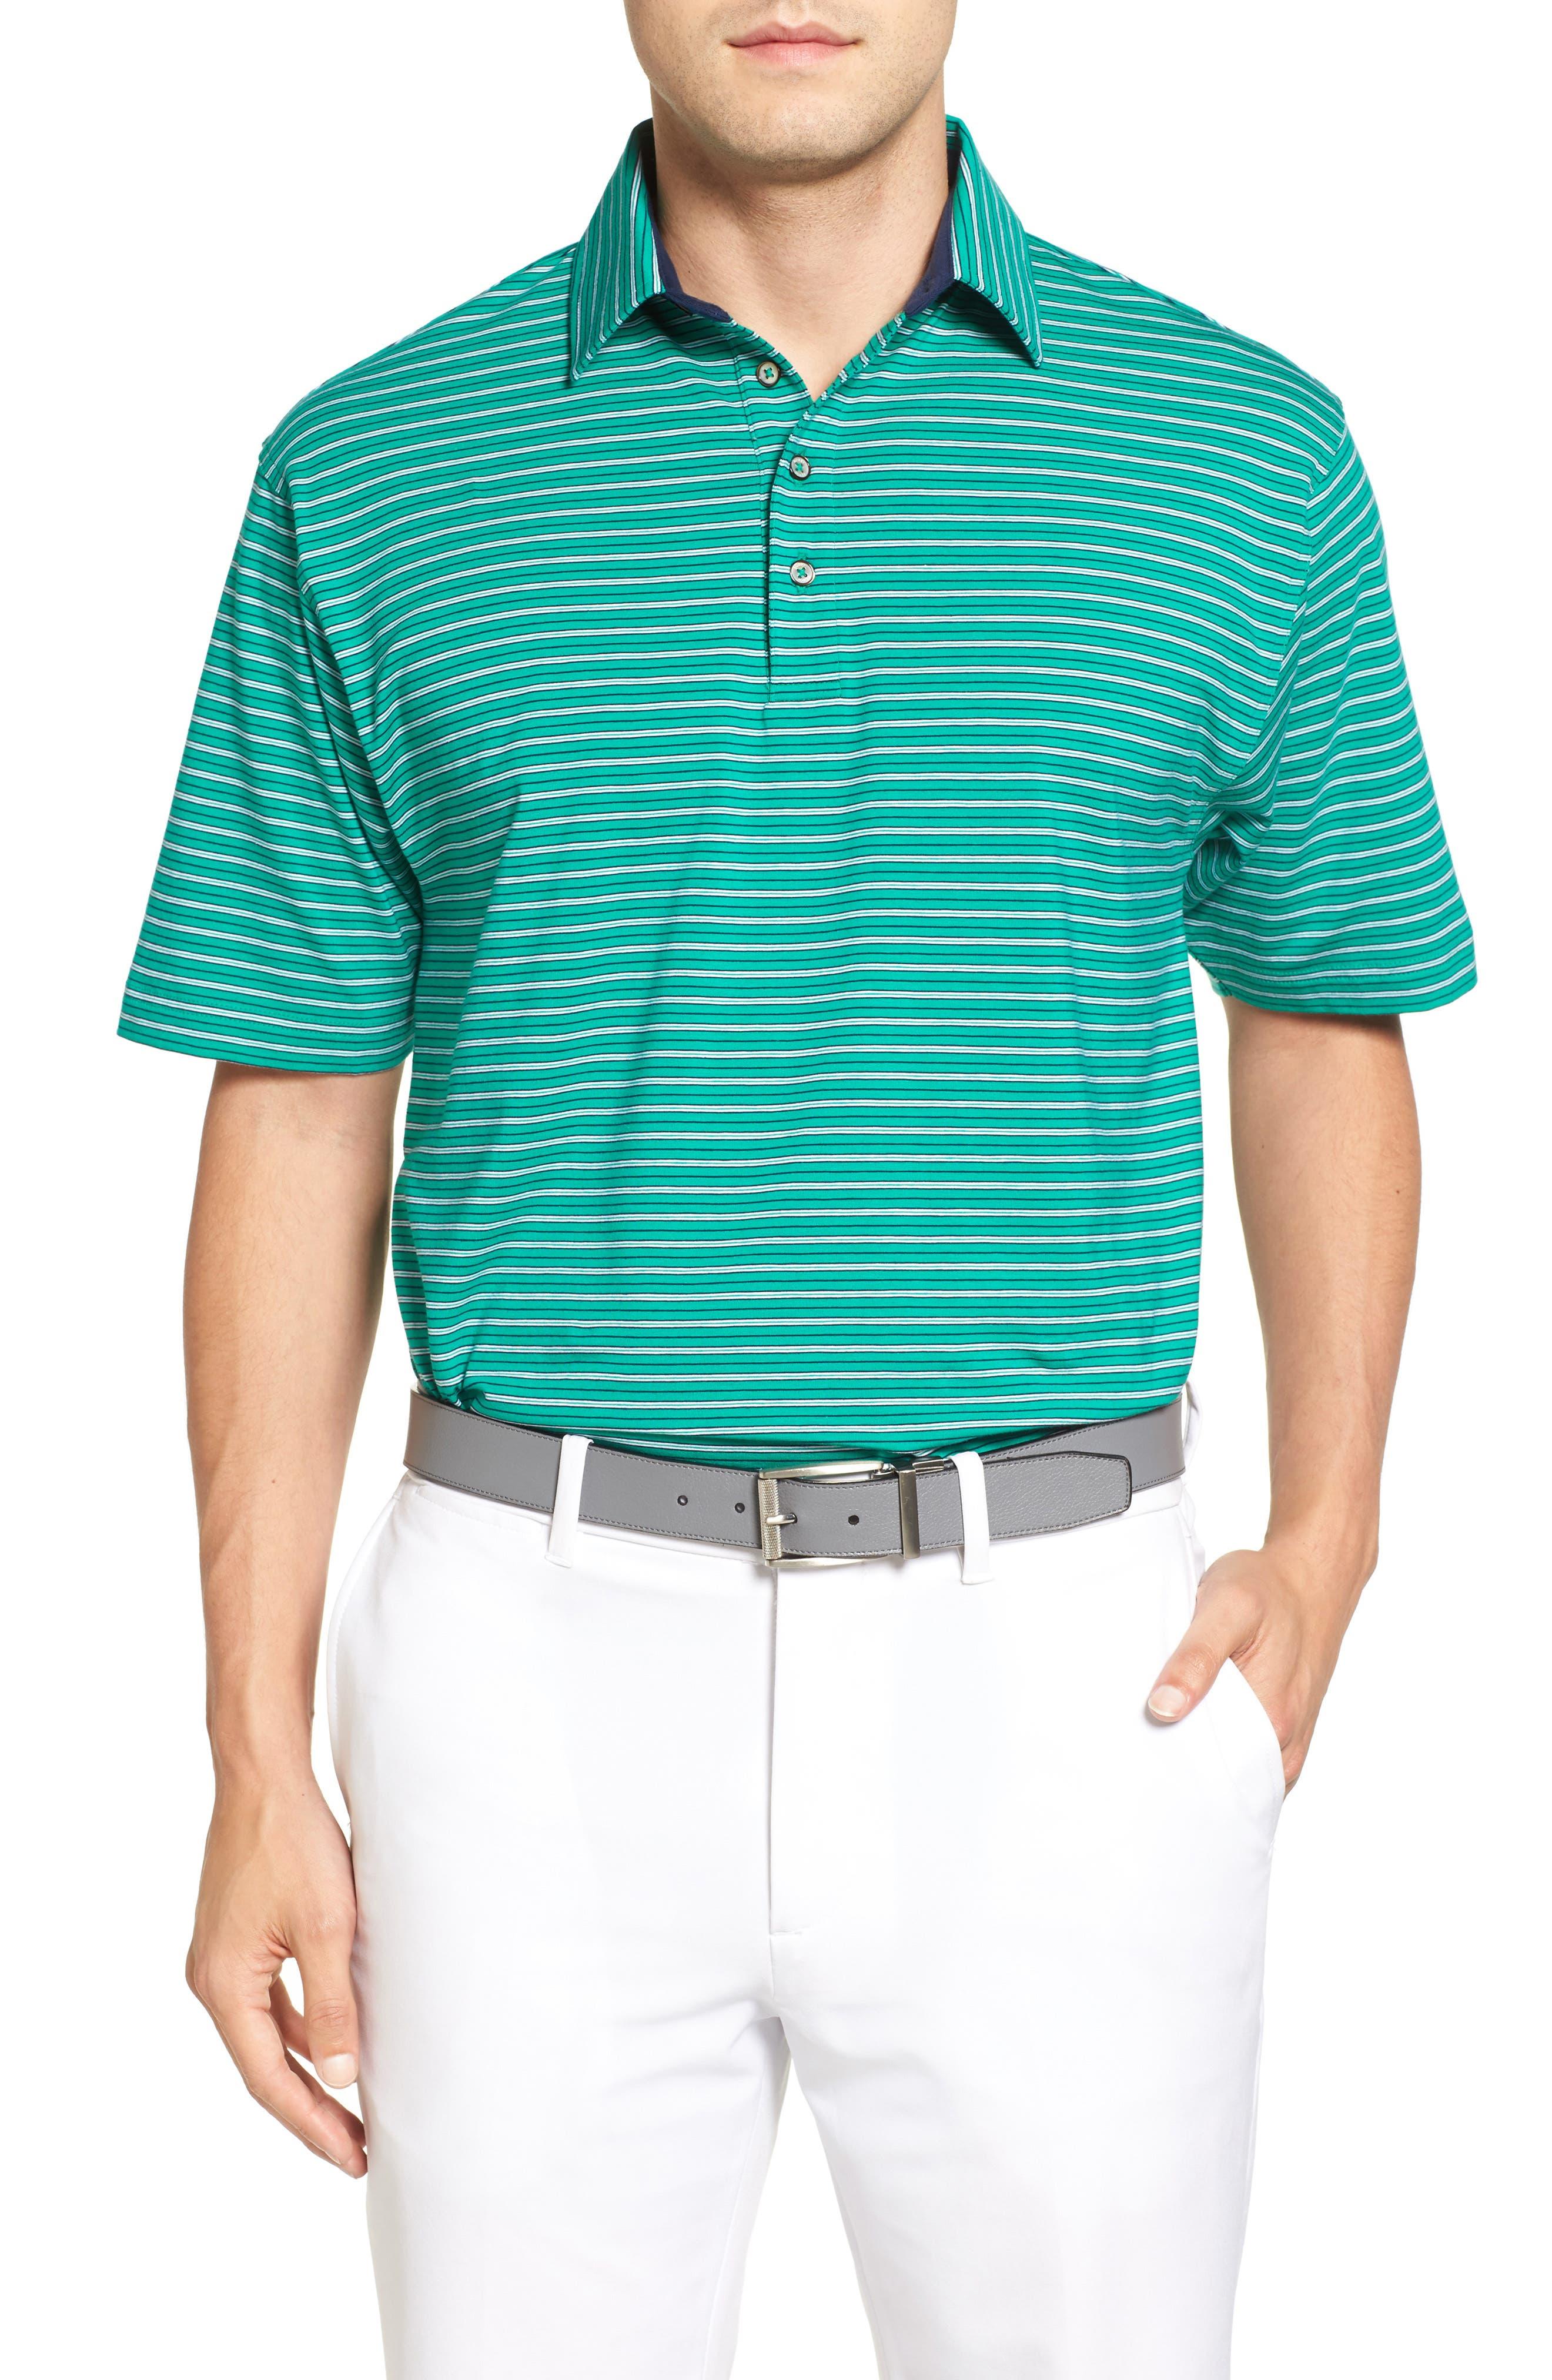 Bobby Jones Liquid Cotton Fine Stripe Polo